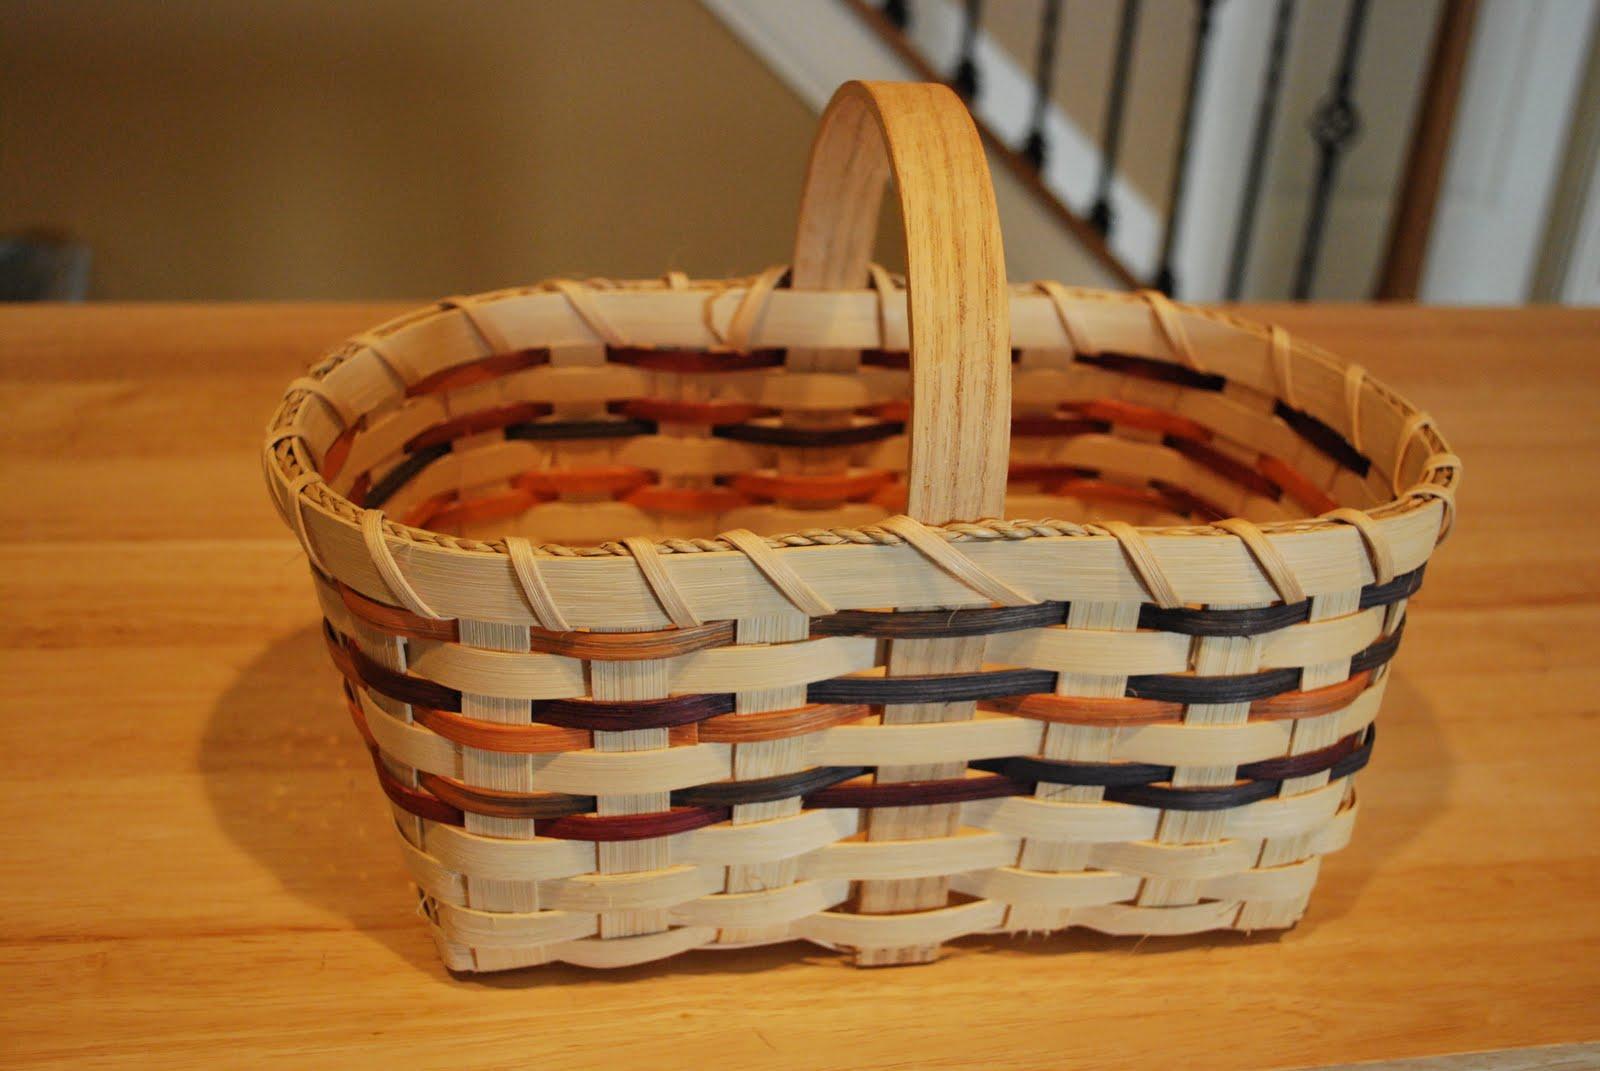 Woven Basket Procedure : Mle s abc a tisket tasket hand woven basket